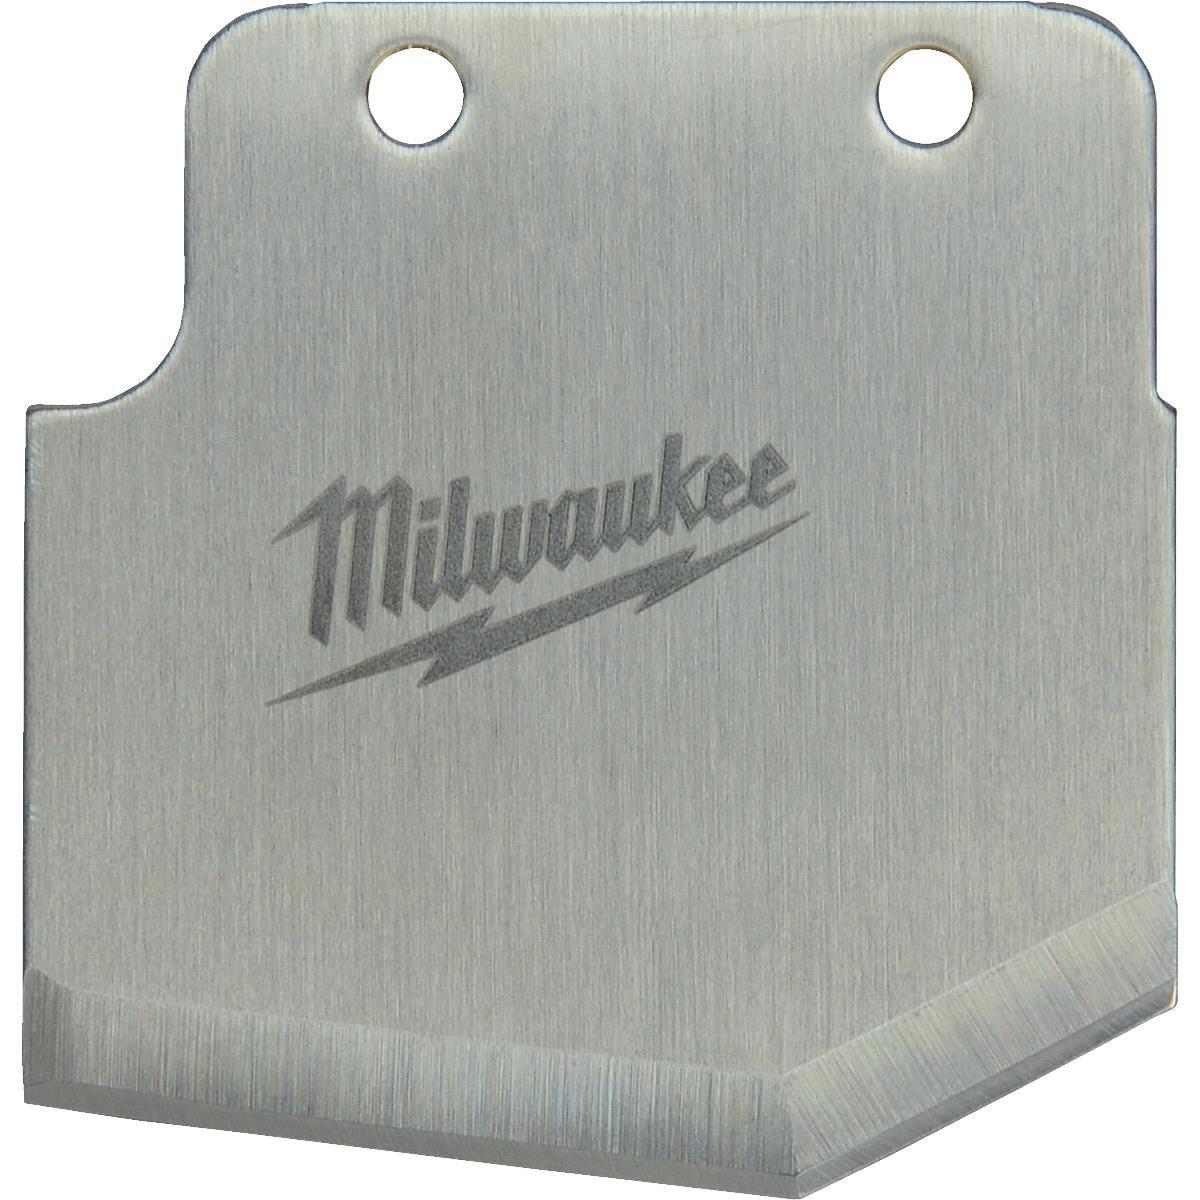 Milwaukee PEX/PVC Tubing Replacement Cutter Blade